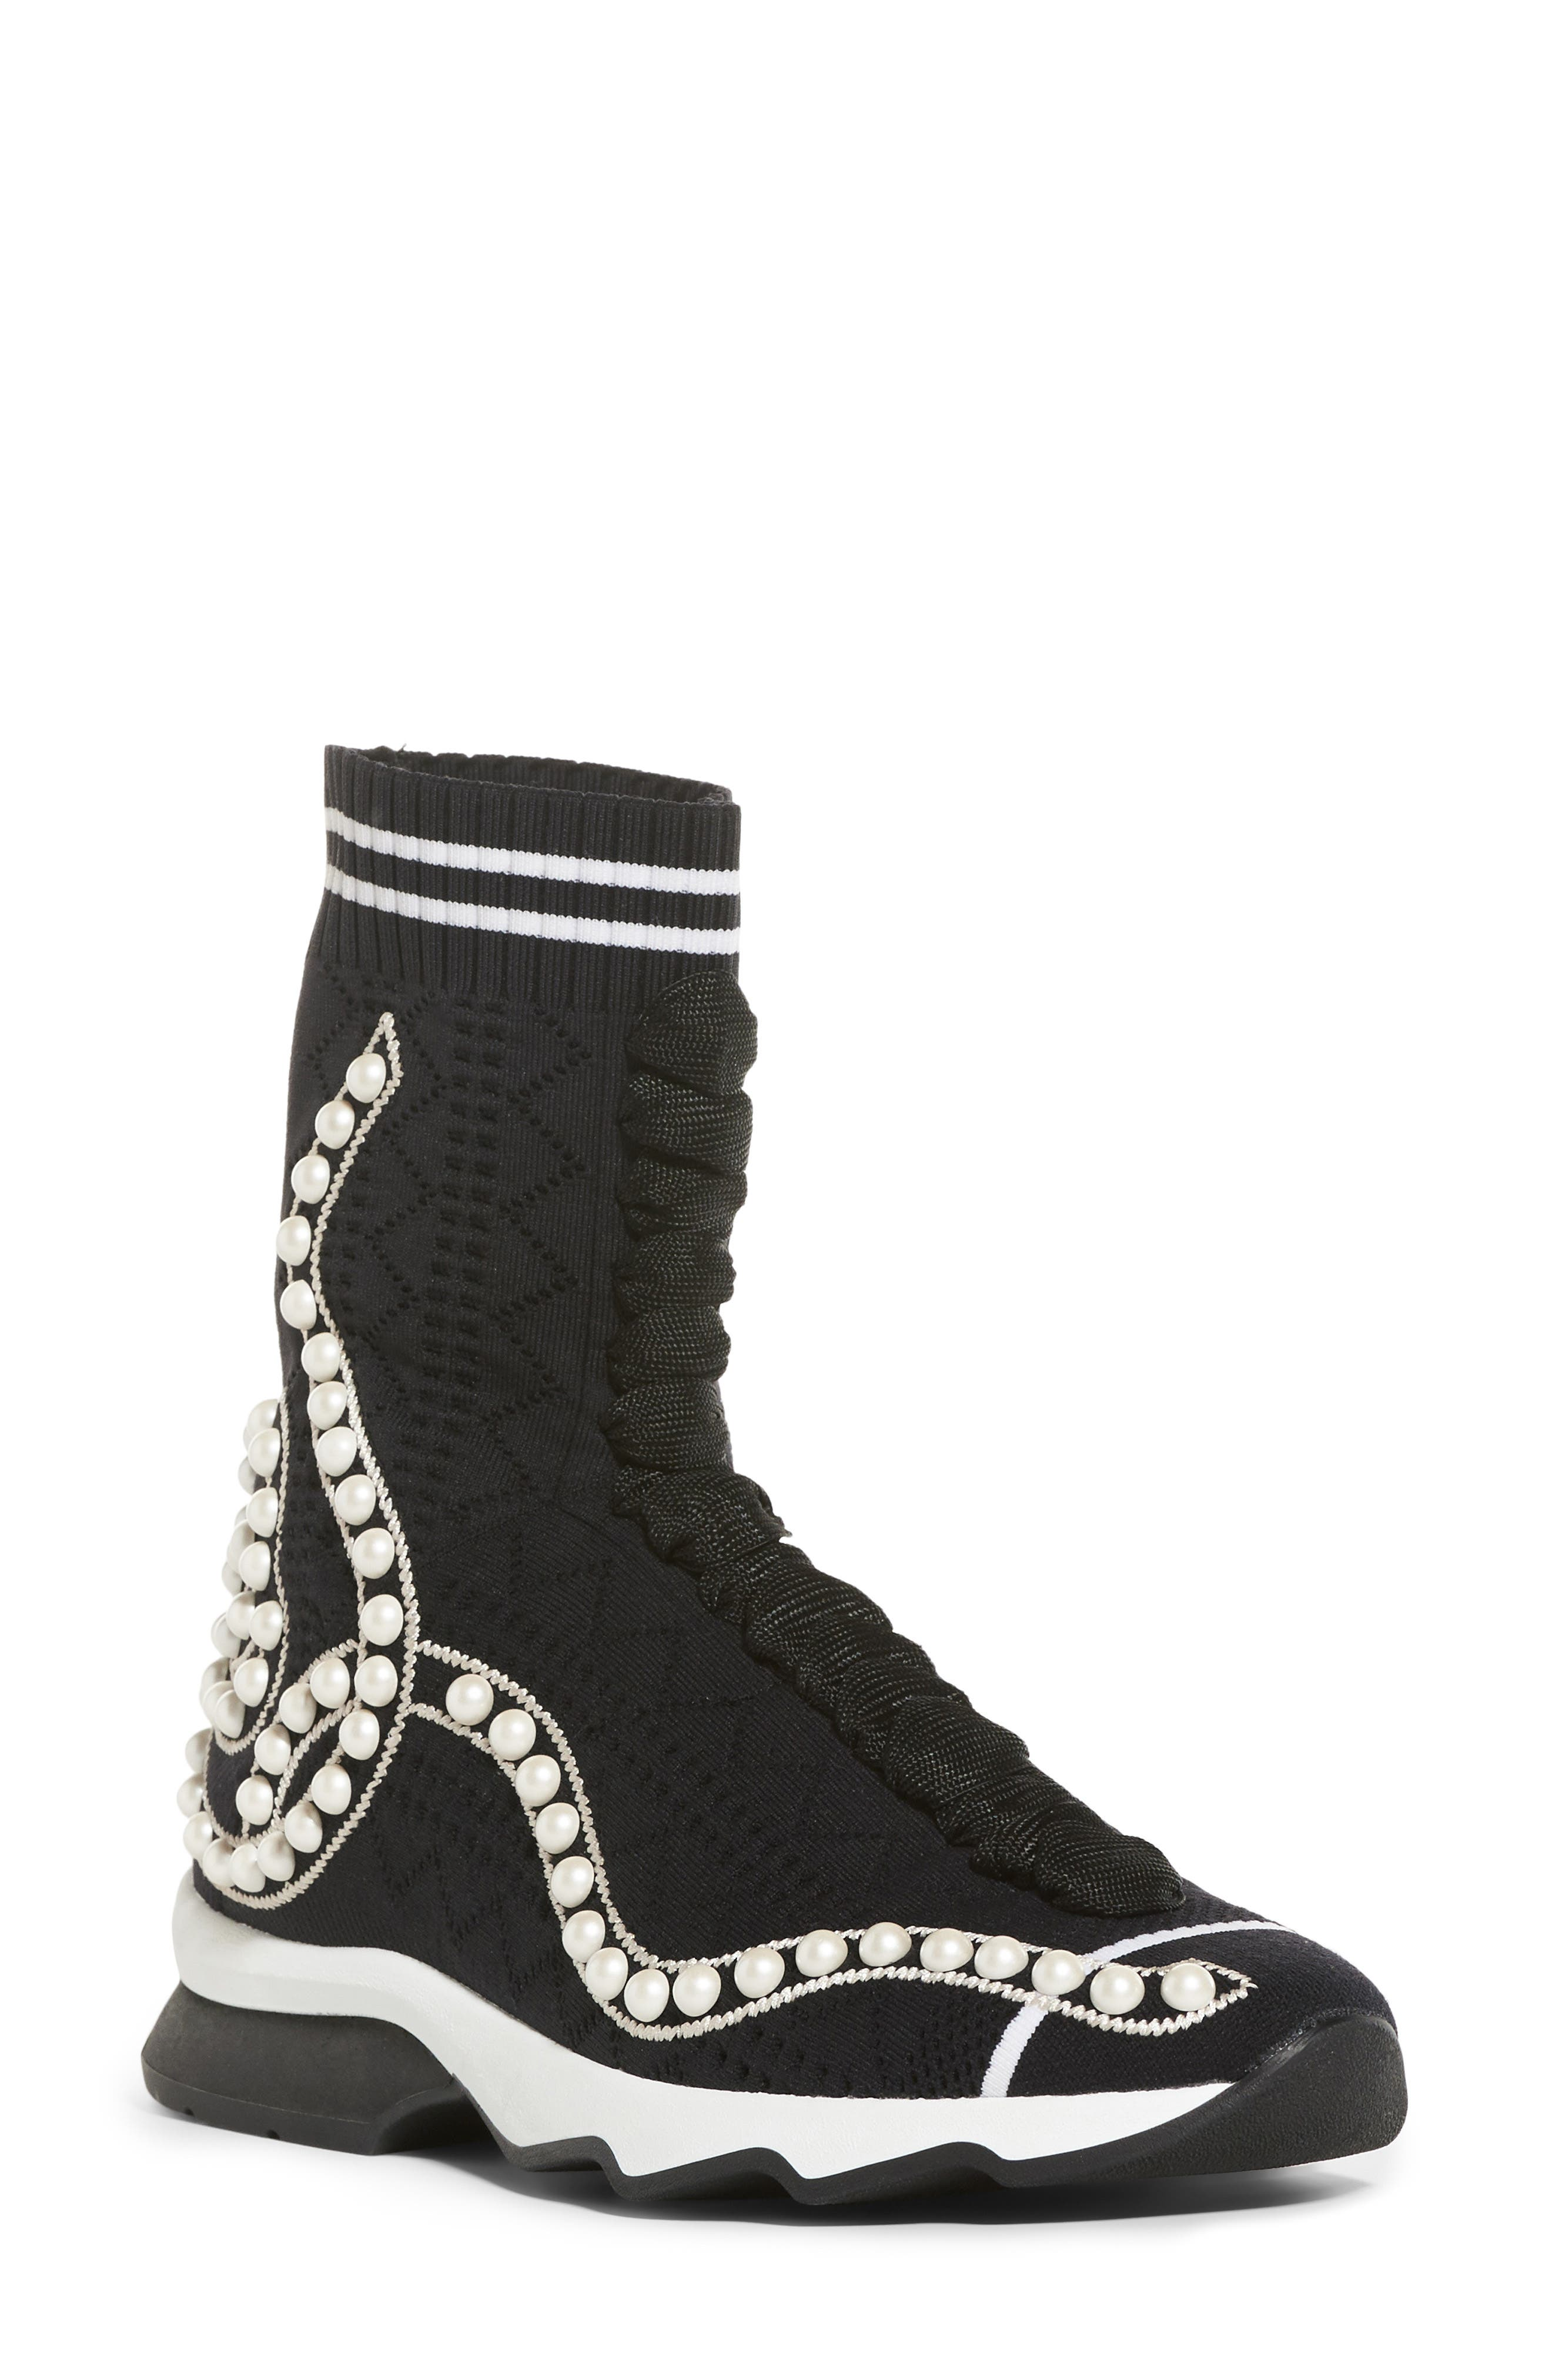 Rockoko Pearland Embellished Sock Sneaker,                             Main thumbnail 1, color,                             Black